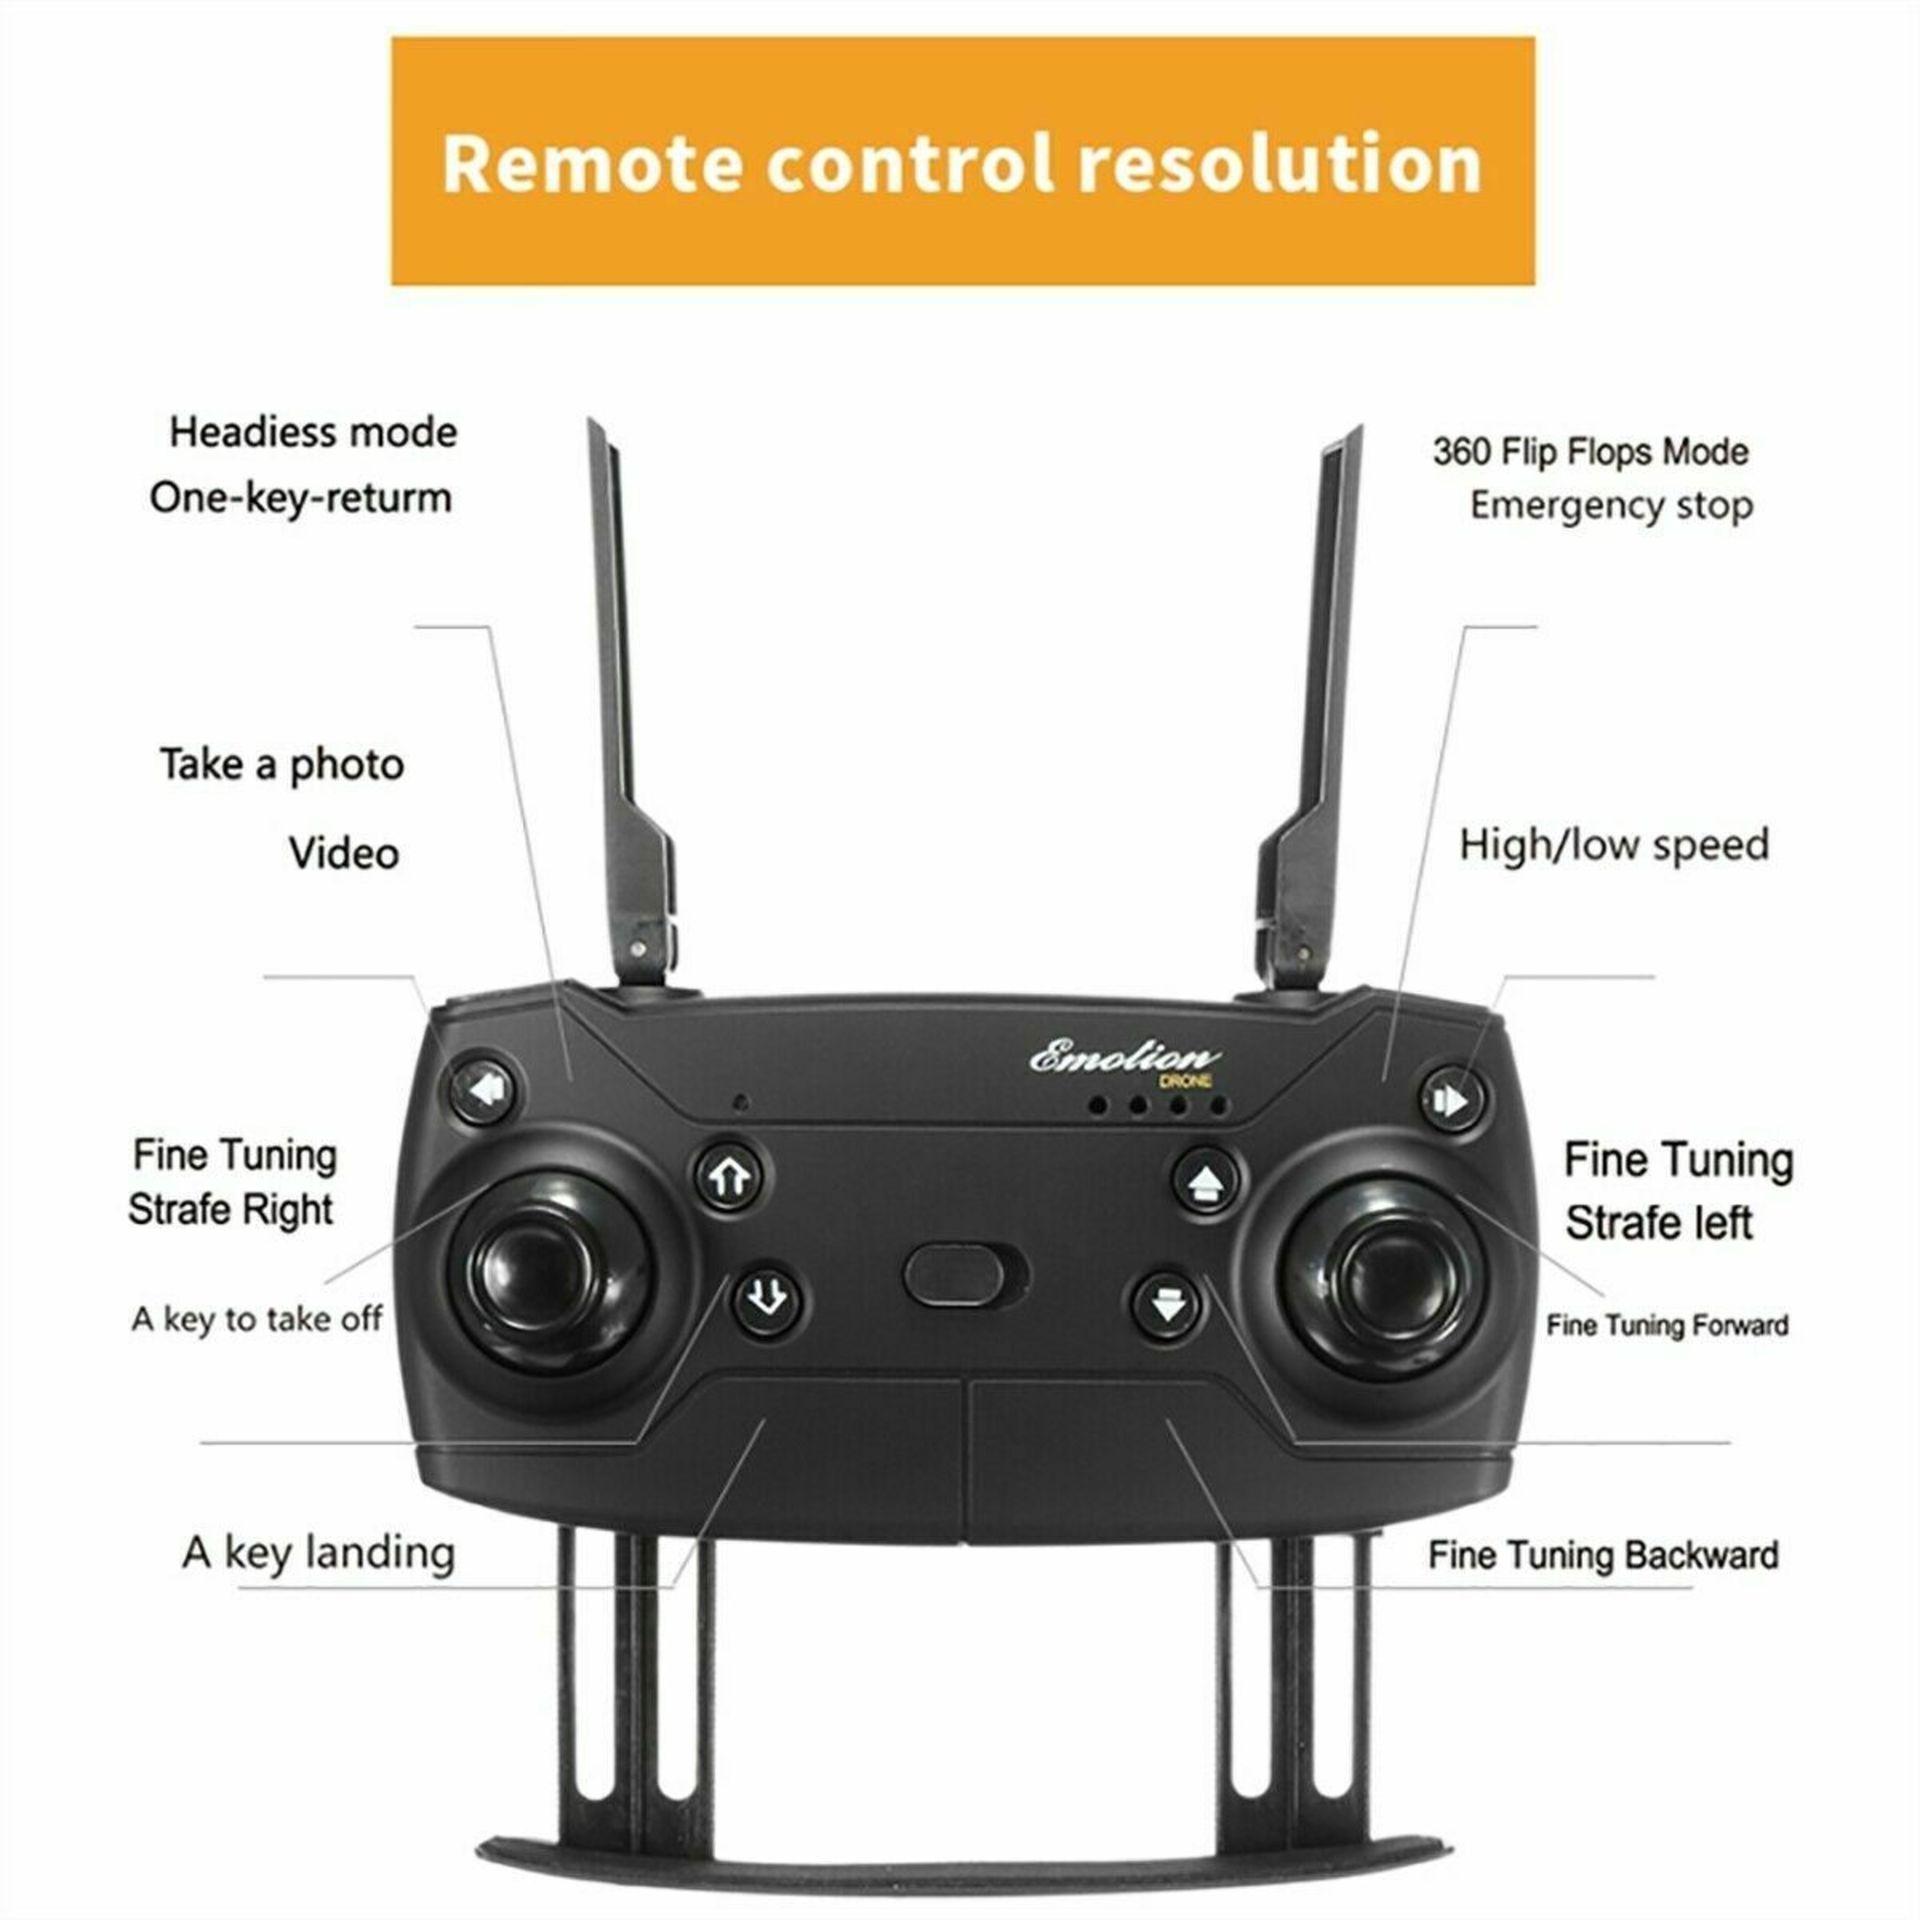 NEW & UNUSED DRONE X PRO WIFI FPV 1080P HD CAMERA FOLDABLE RC QUADCOPTER + BAG *PLUS VAT* - Image 5 of 12